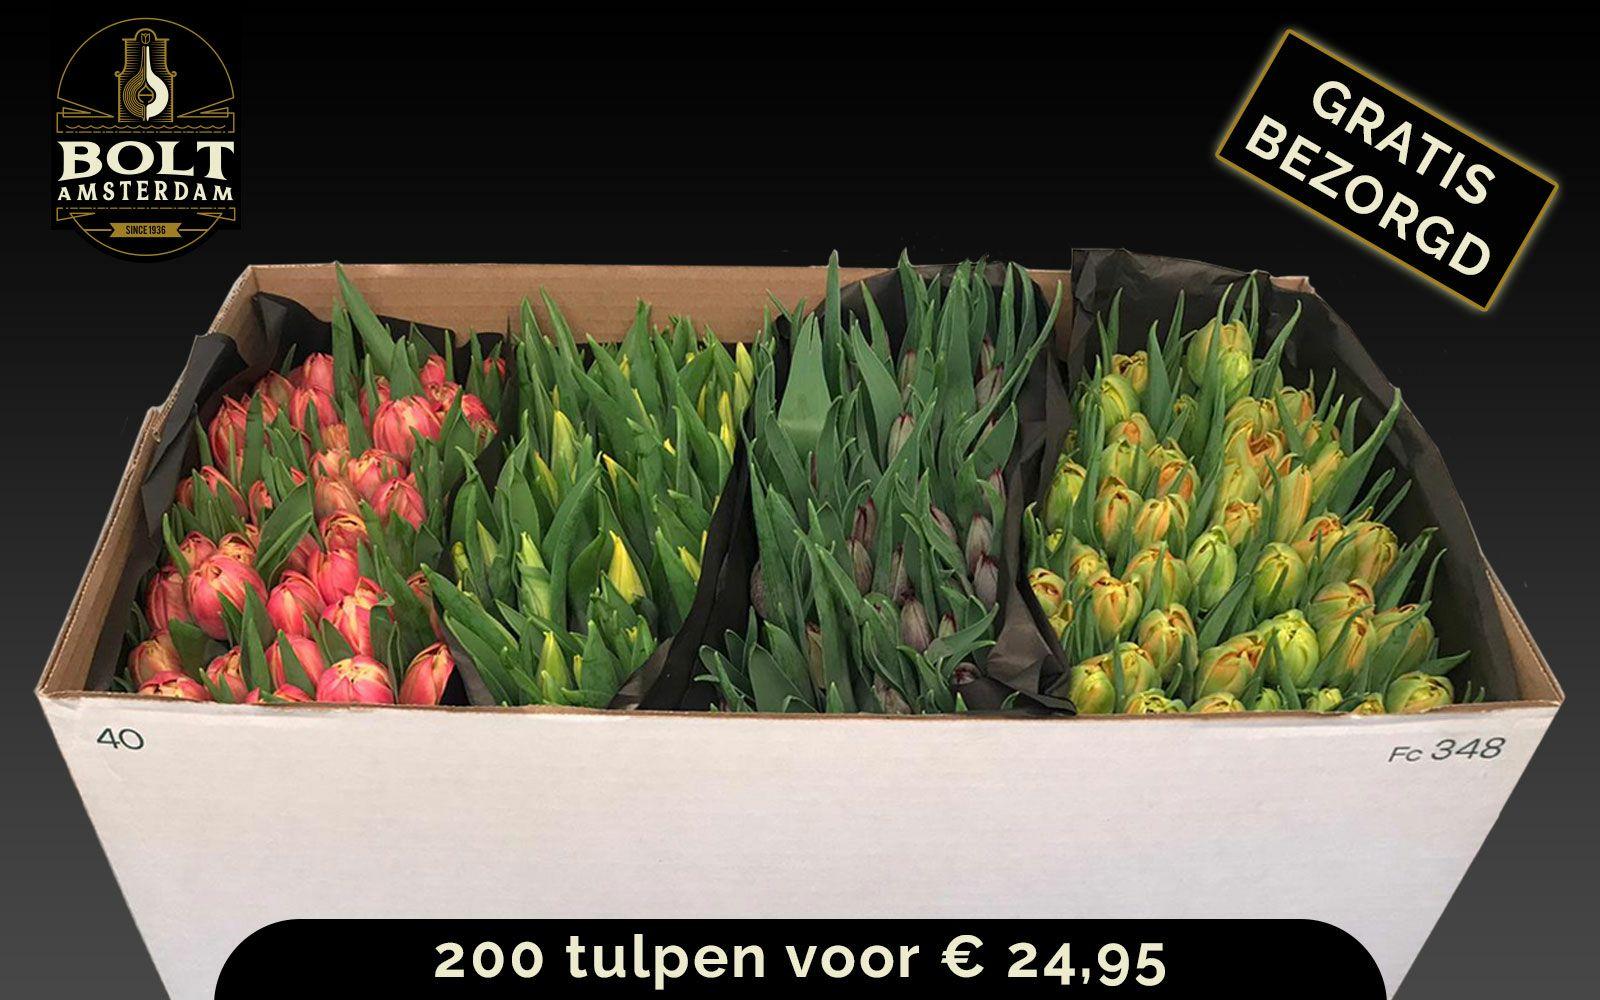 200 tulpen vanaf €24,95 @ Bolt-Amsterdam.nl